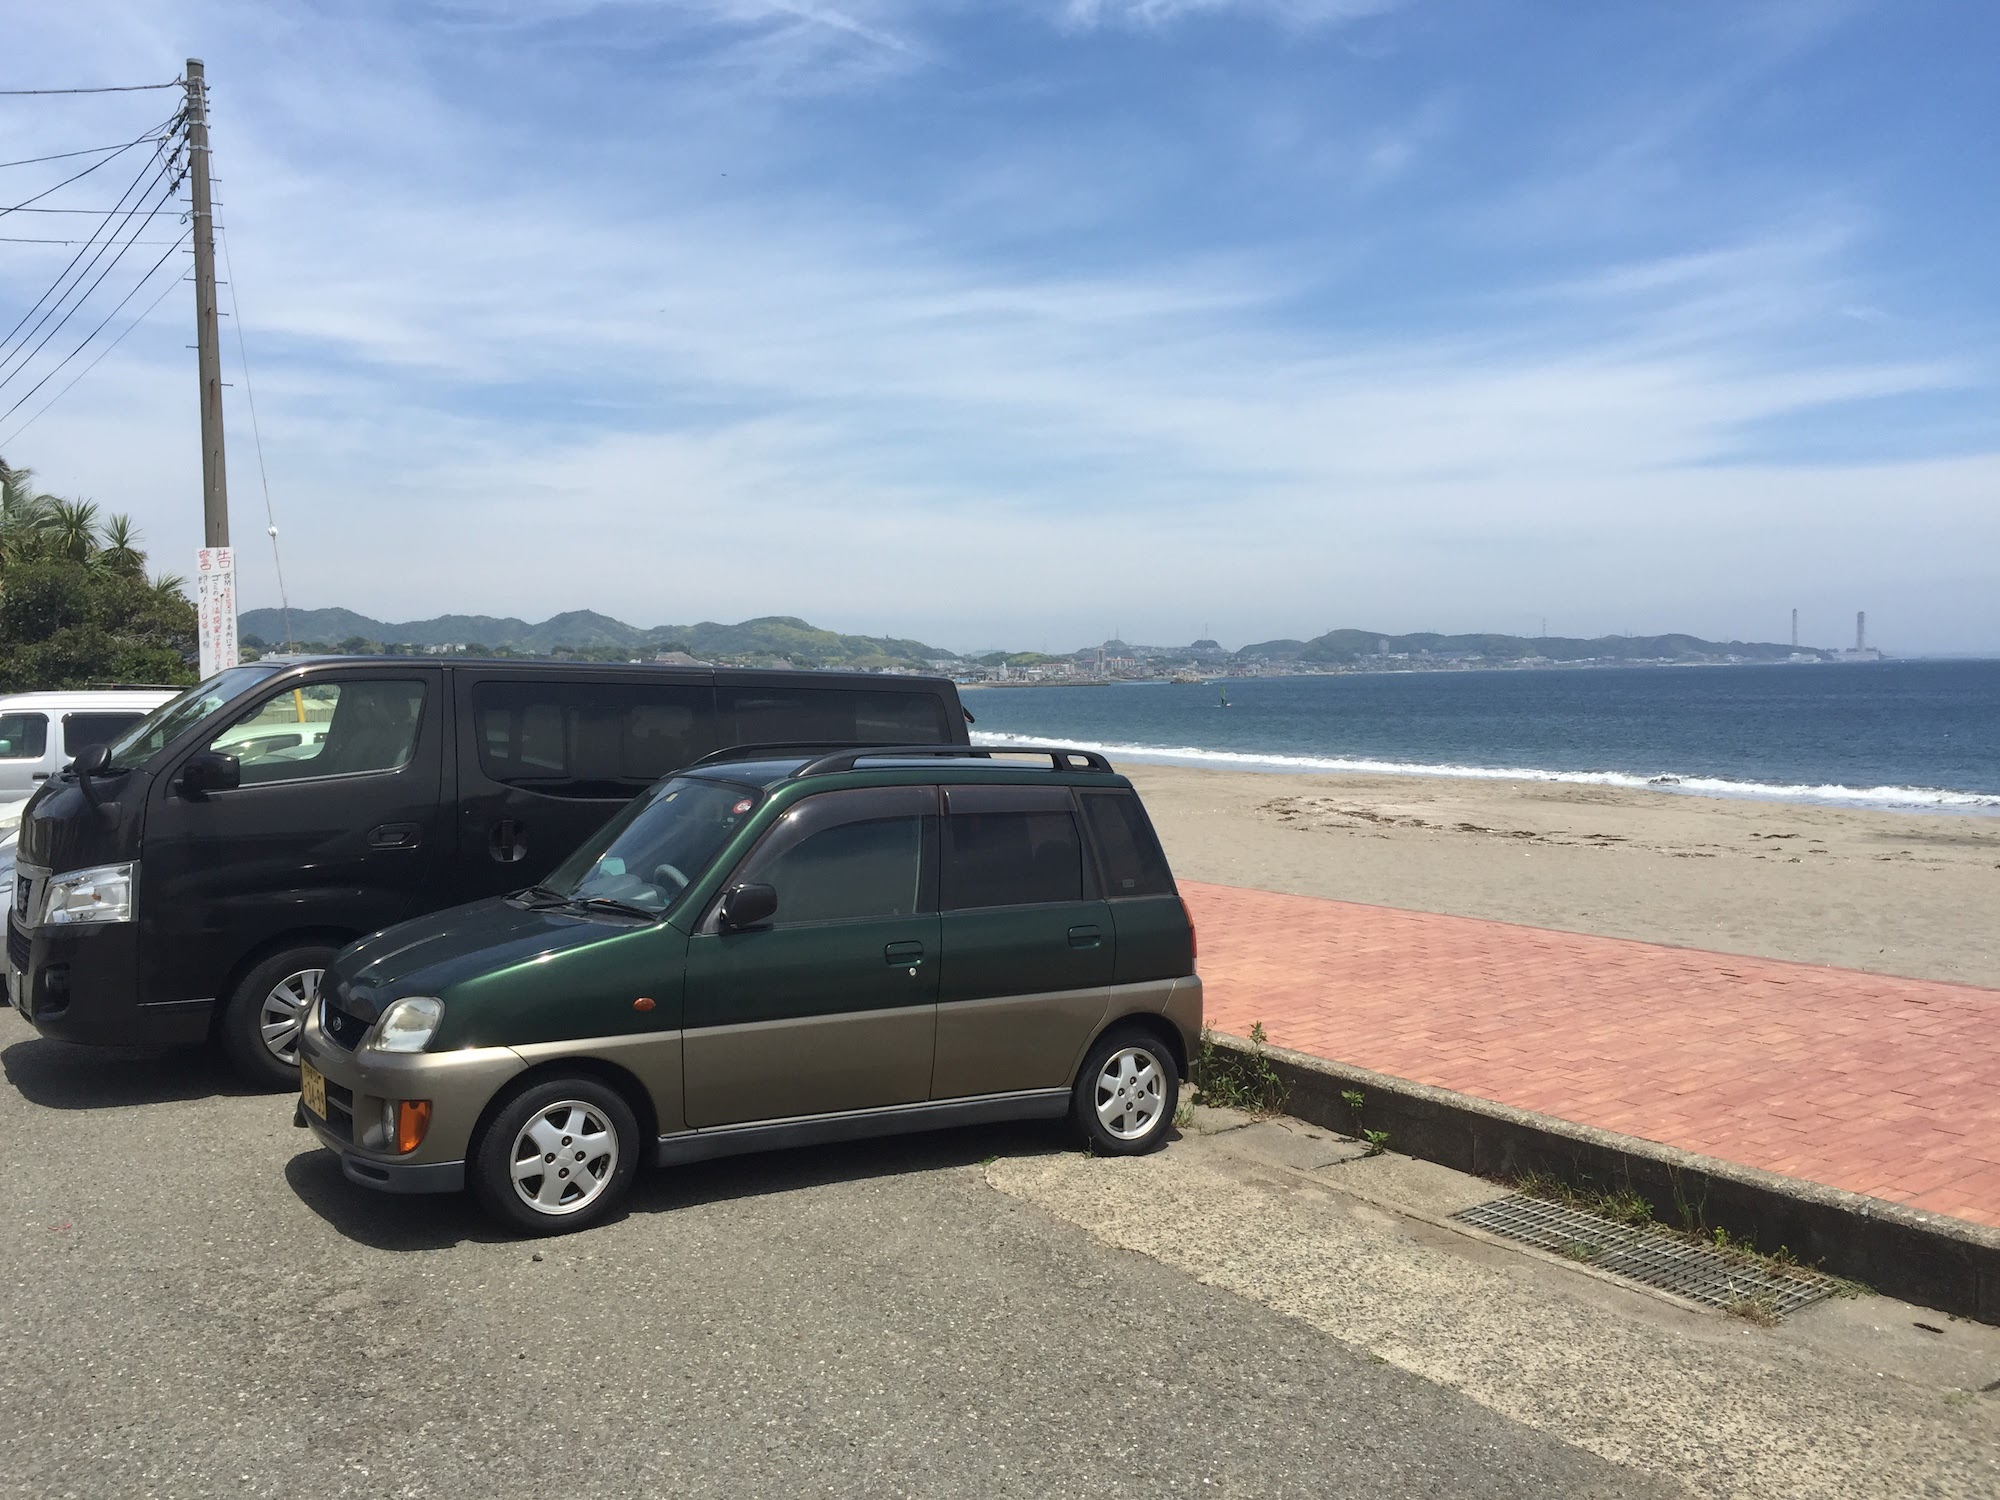 full size van next to a kei car